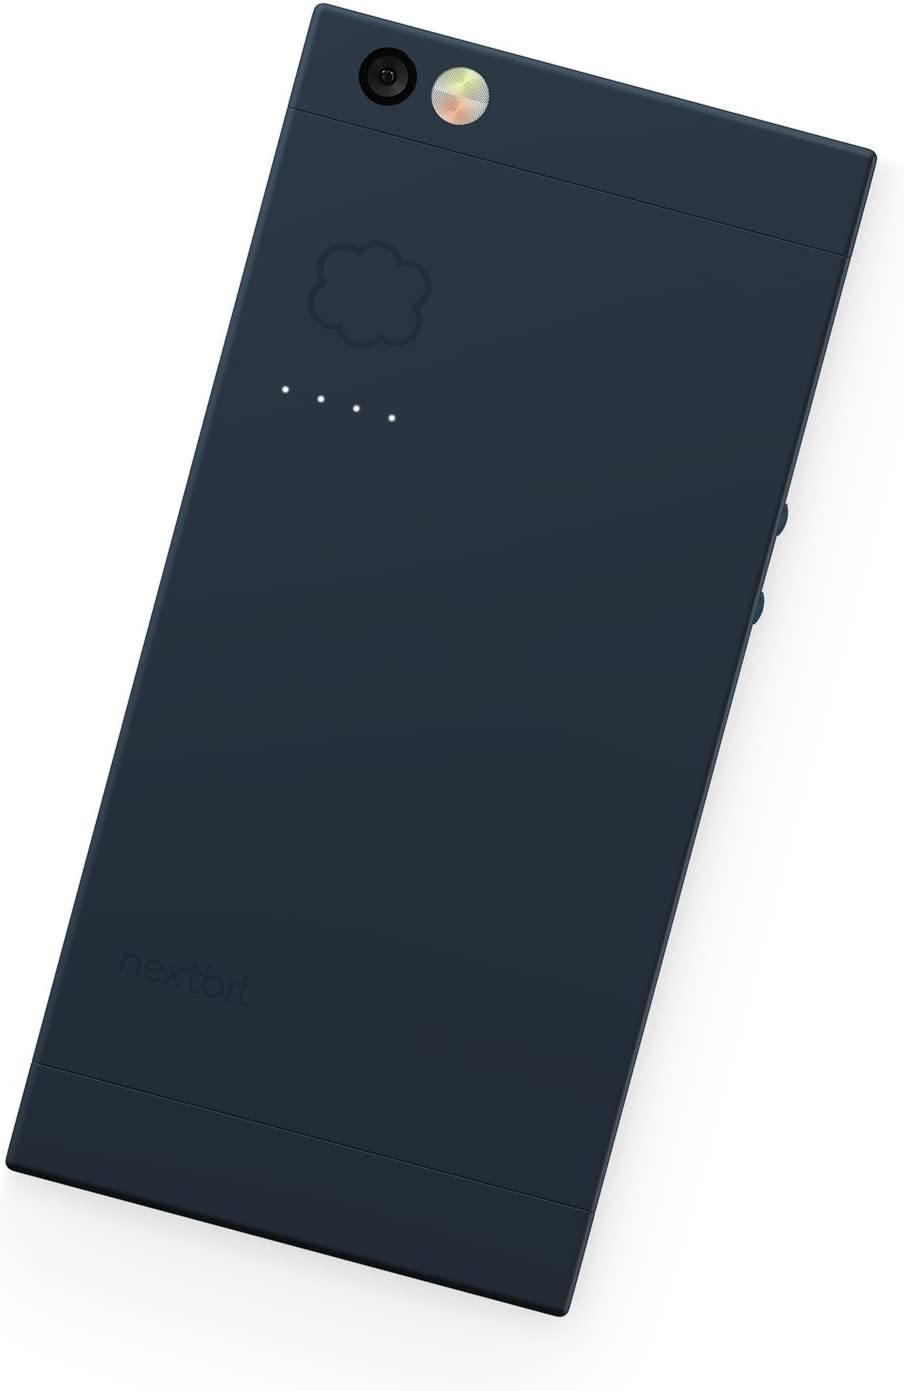 Nextbit Robin fábrica gsm Desbloqueado Smartphone: Amazon.es ...